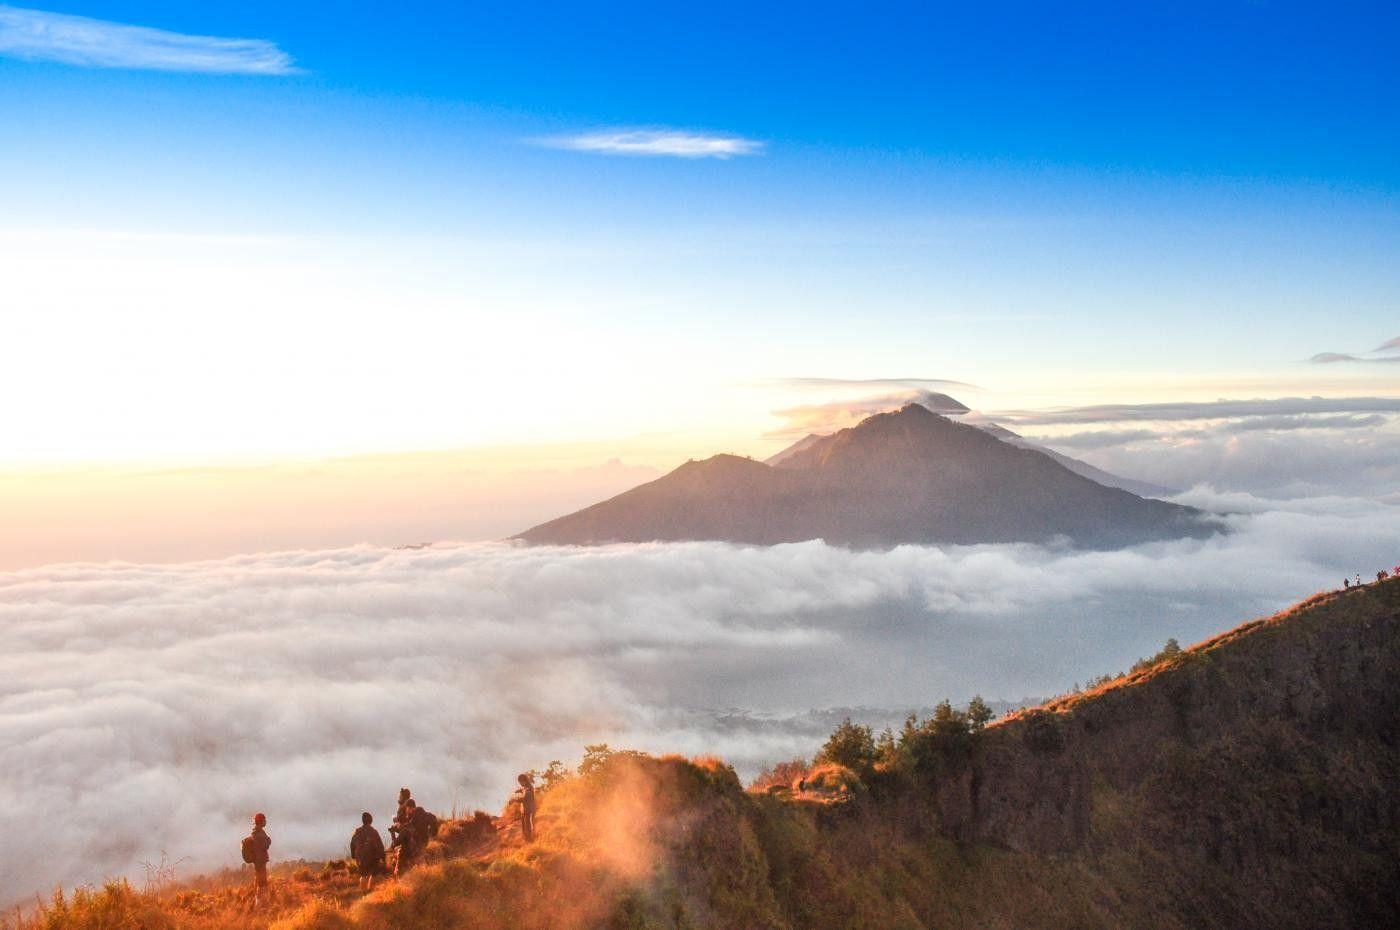 Pemandangan Kabut Lautan Awan Gunung Batur Kintamani Bali Indonesia Traveller Pemandangan Maldives Awan